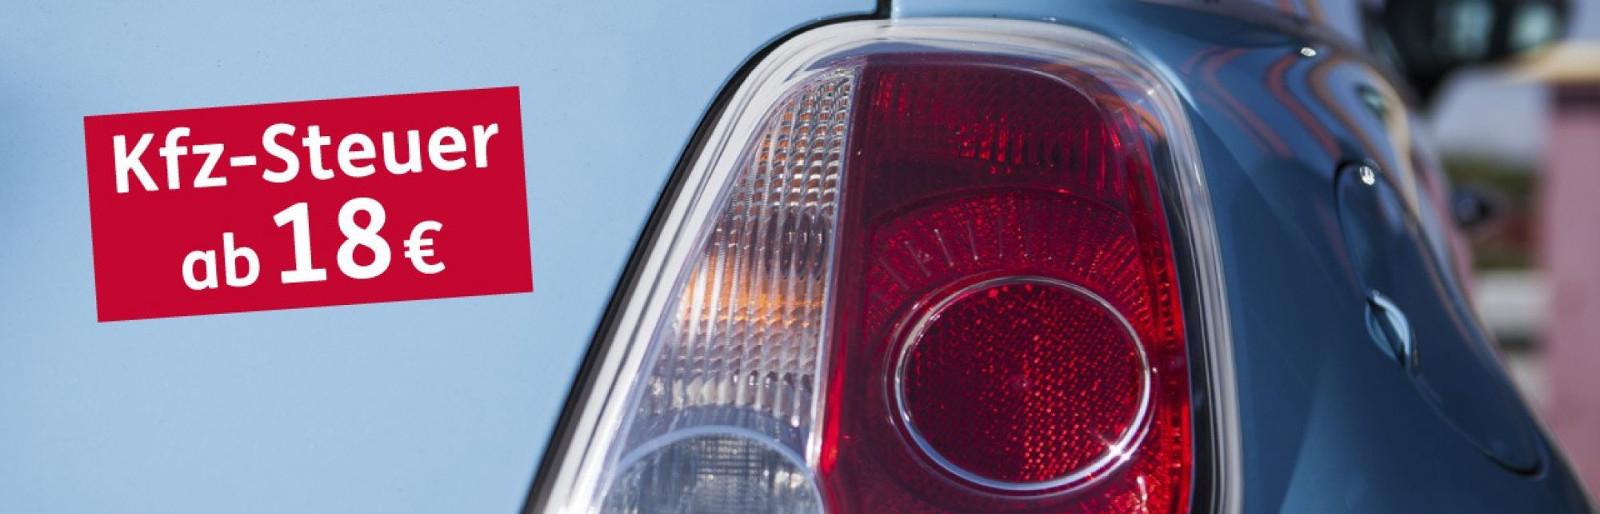 Kfz Steuer Fiat 500 Ergo